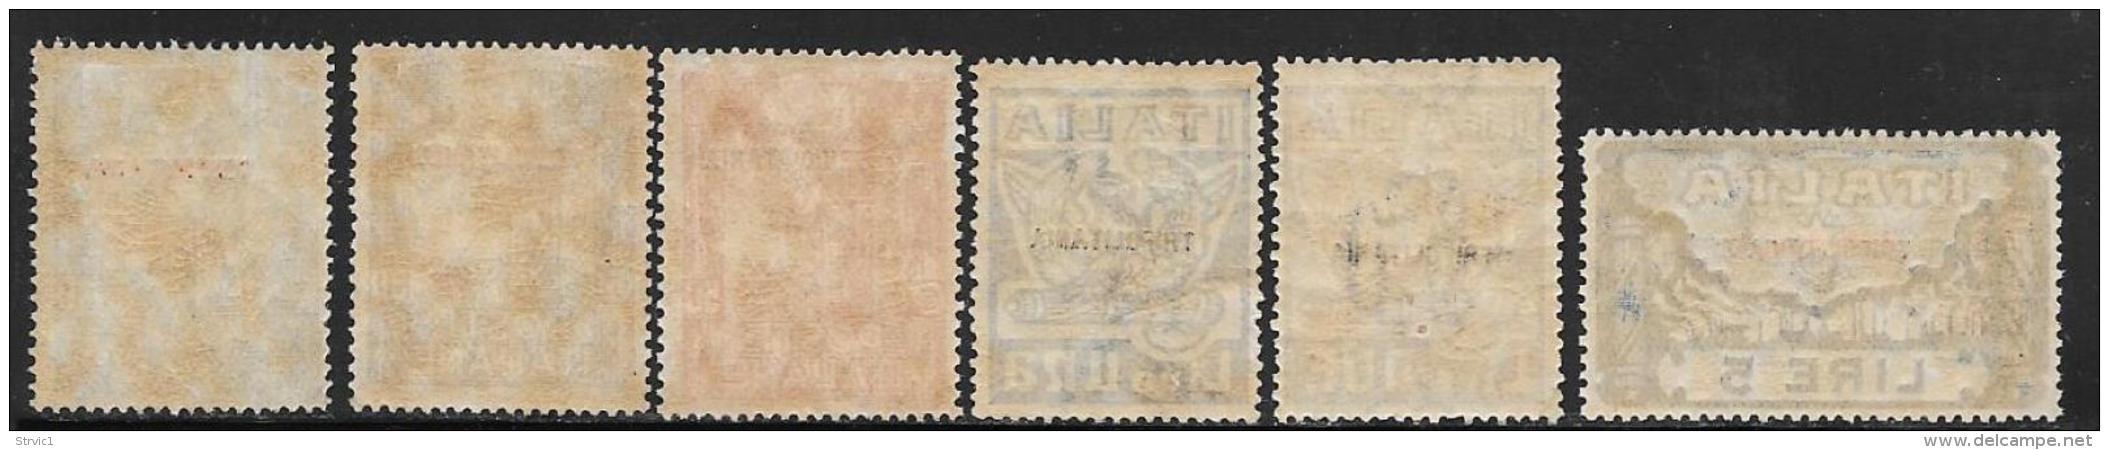 Tripolitania, Scott # 5-10 Mint Hinged Italy Fascisti Issue Overprinted, 1923 - Tripolitania